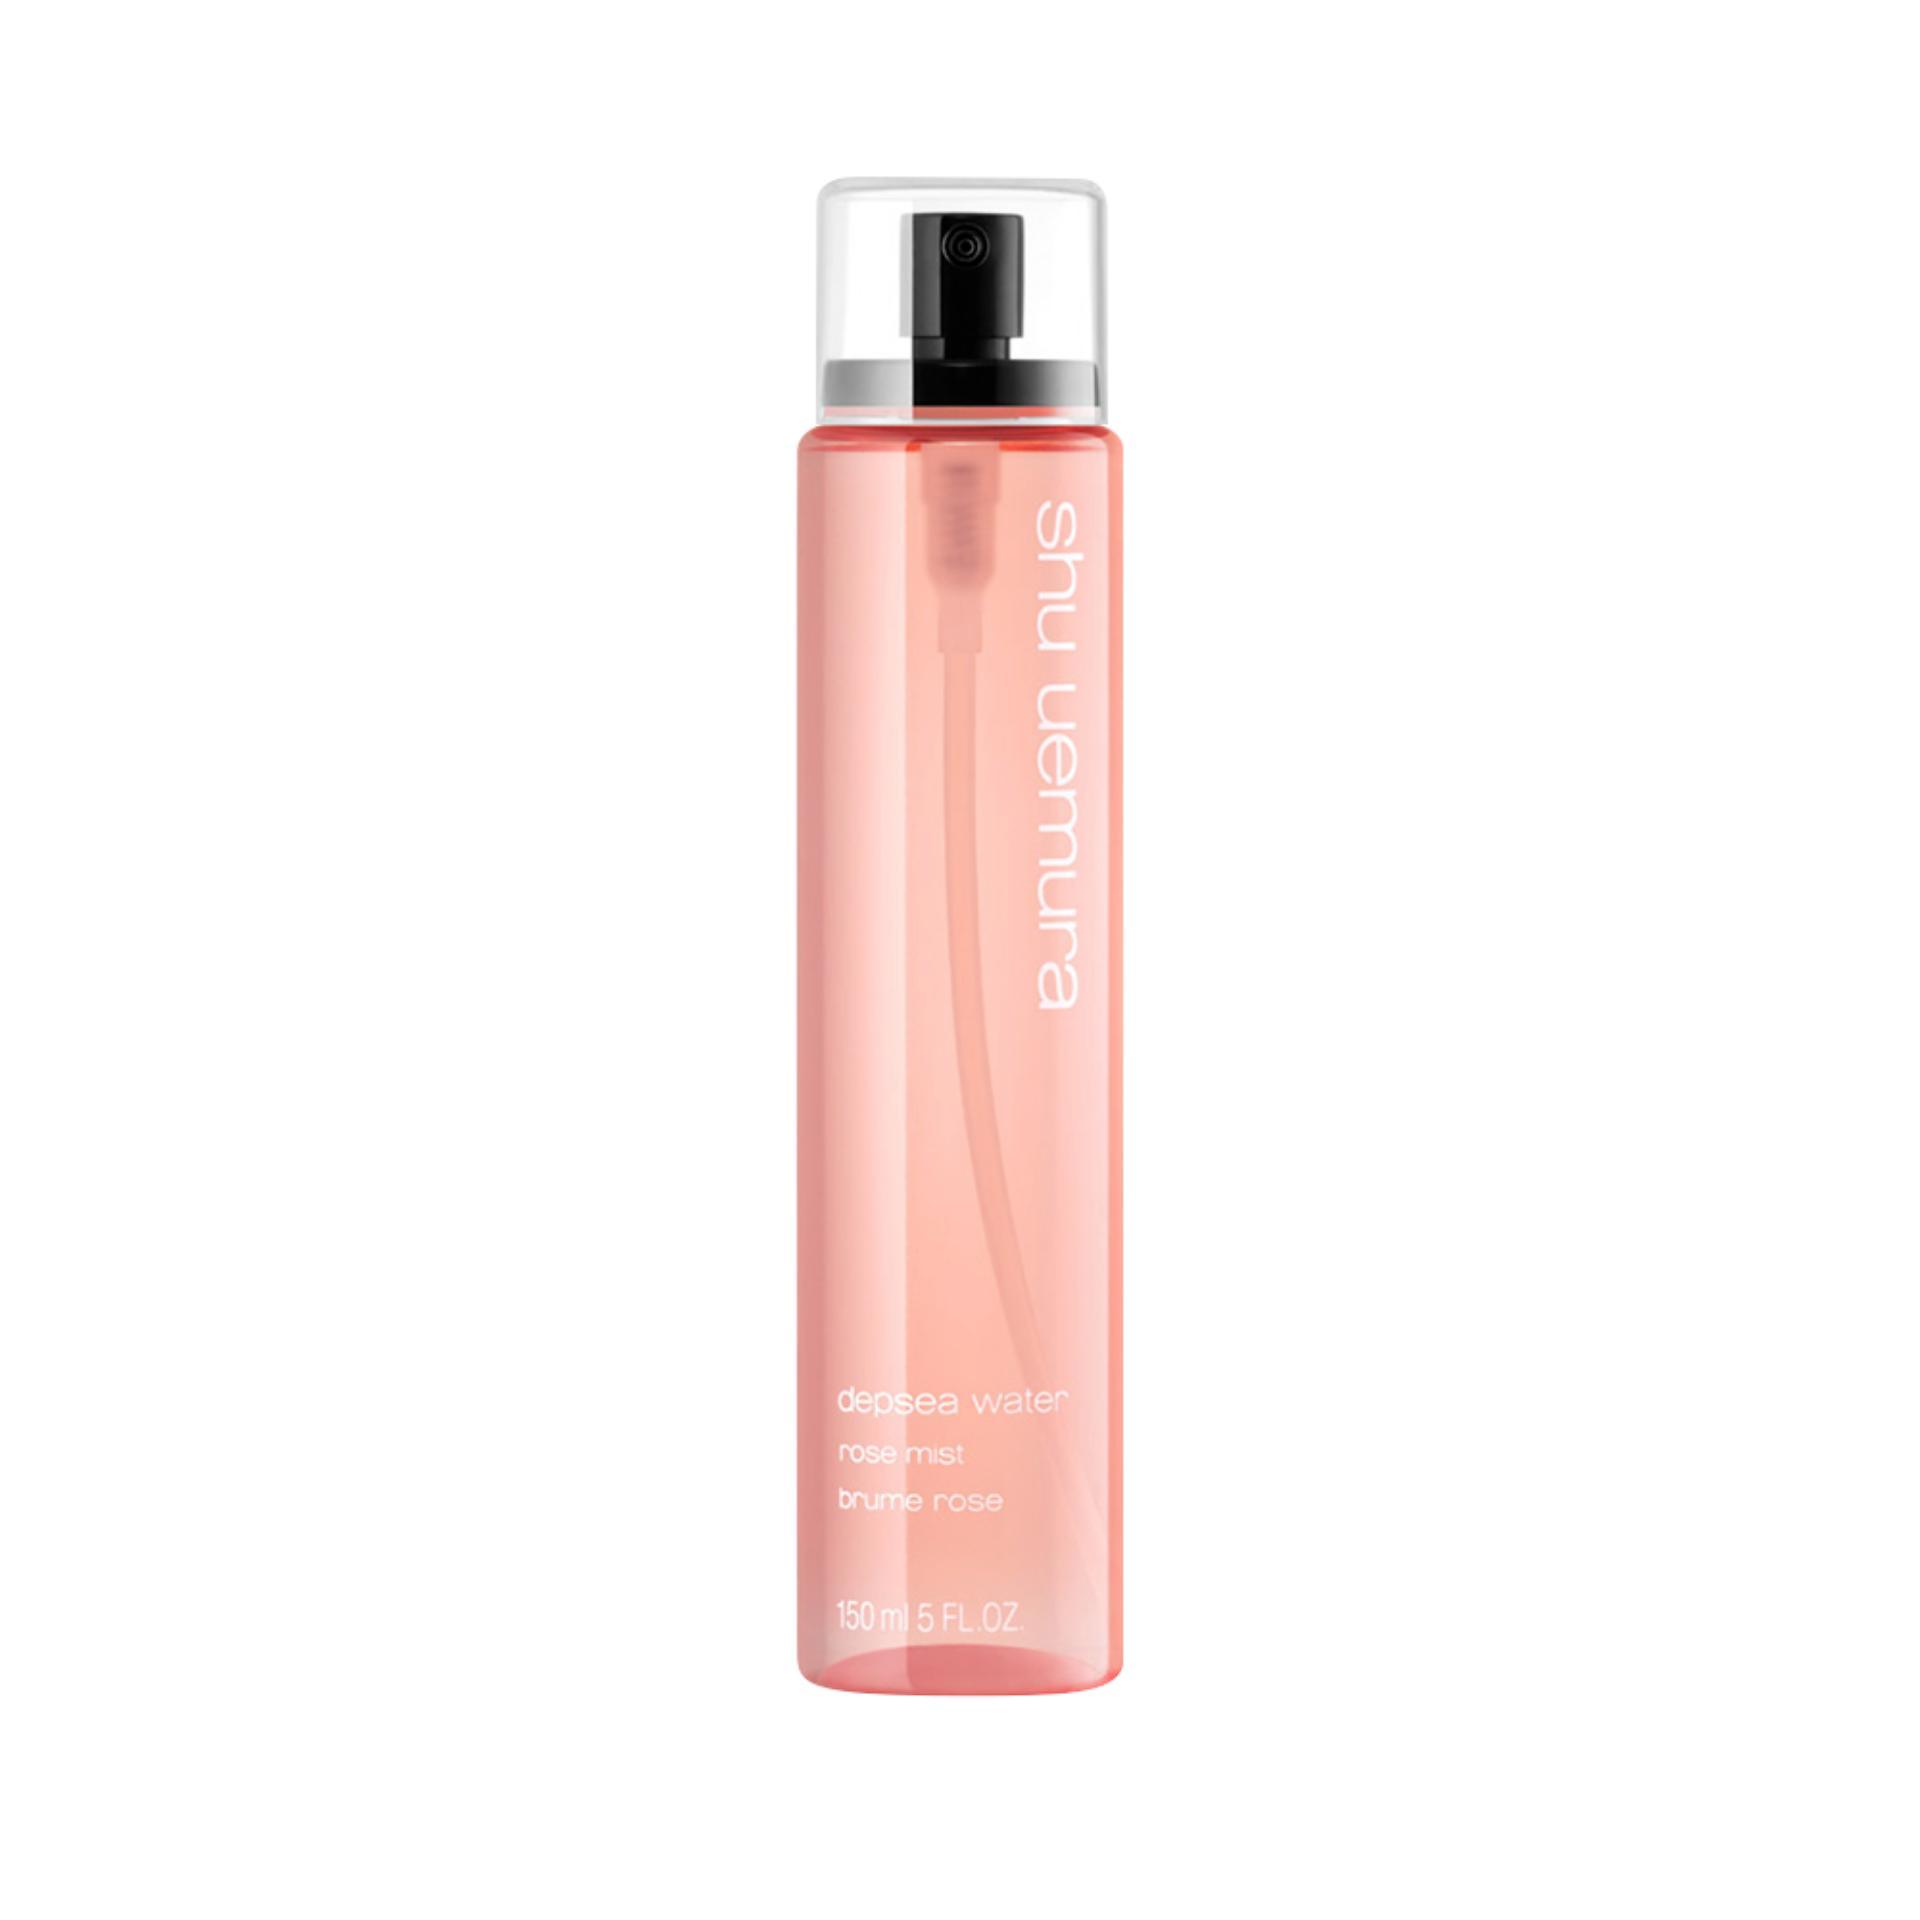 Shu Uemura Depsea Water Facial Mist Rose 150ml